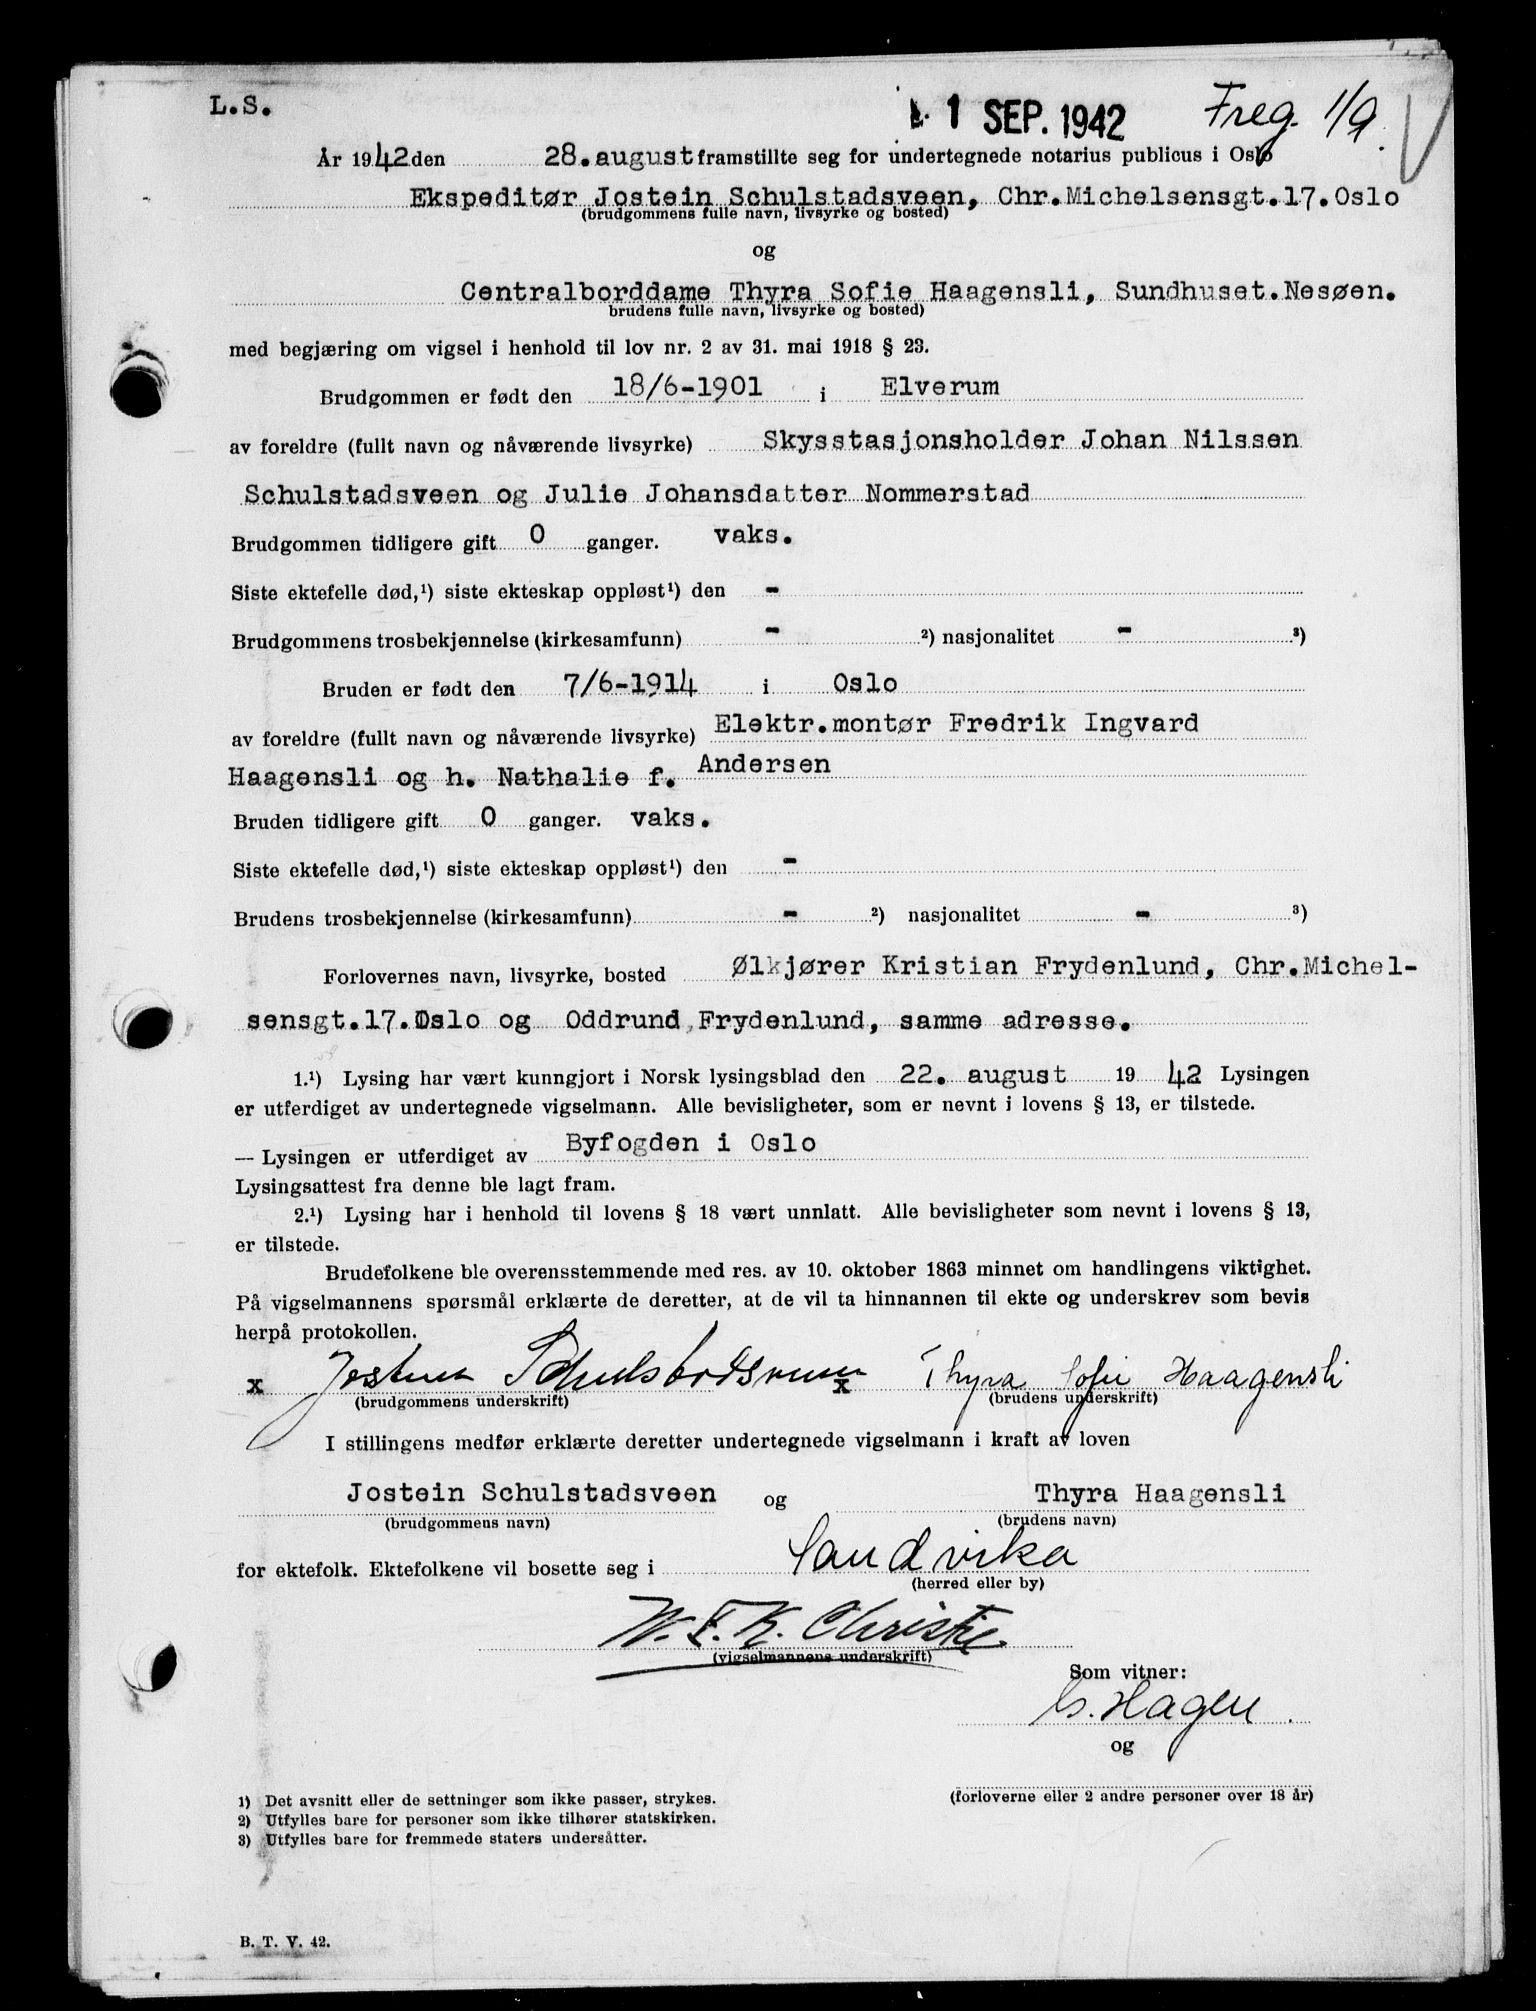 SAO, Oslo byfogd avd. I, L/Lb/Lbb/L0041: Notarialprotokoll, rekke II: Vigsler, 1942, s. upaginert